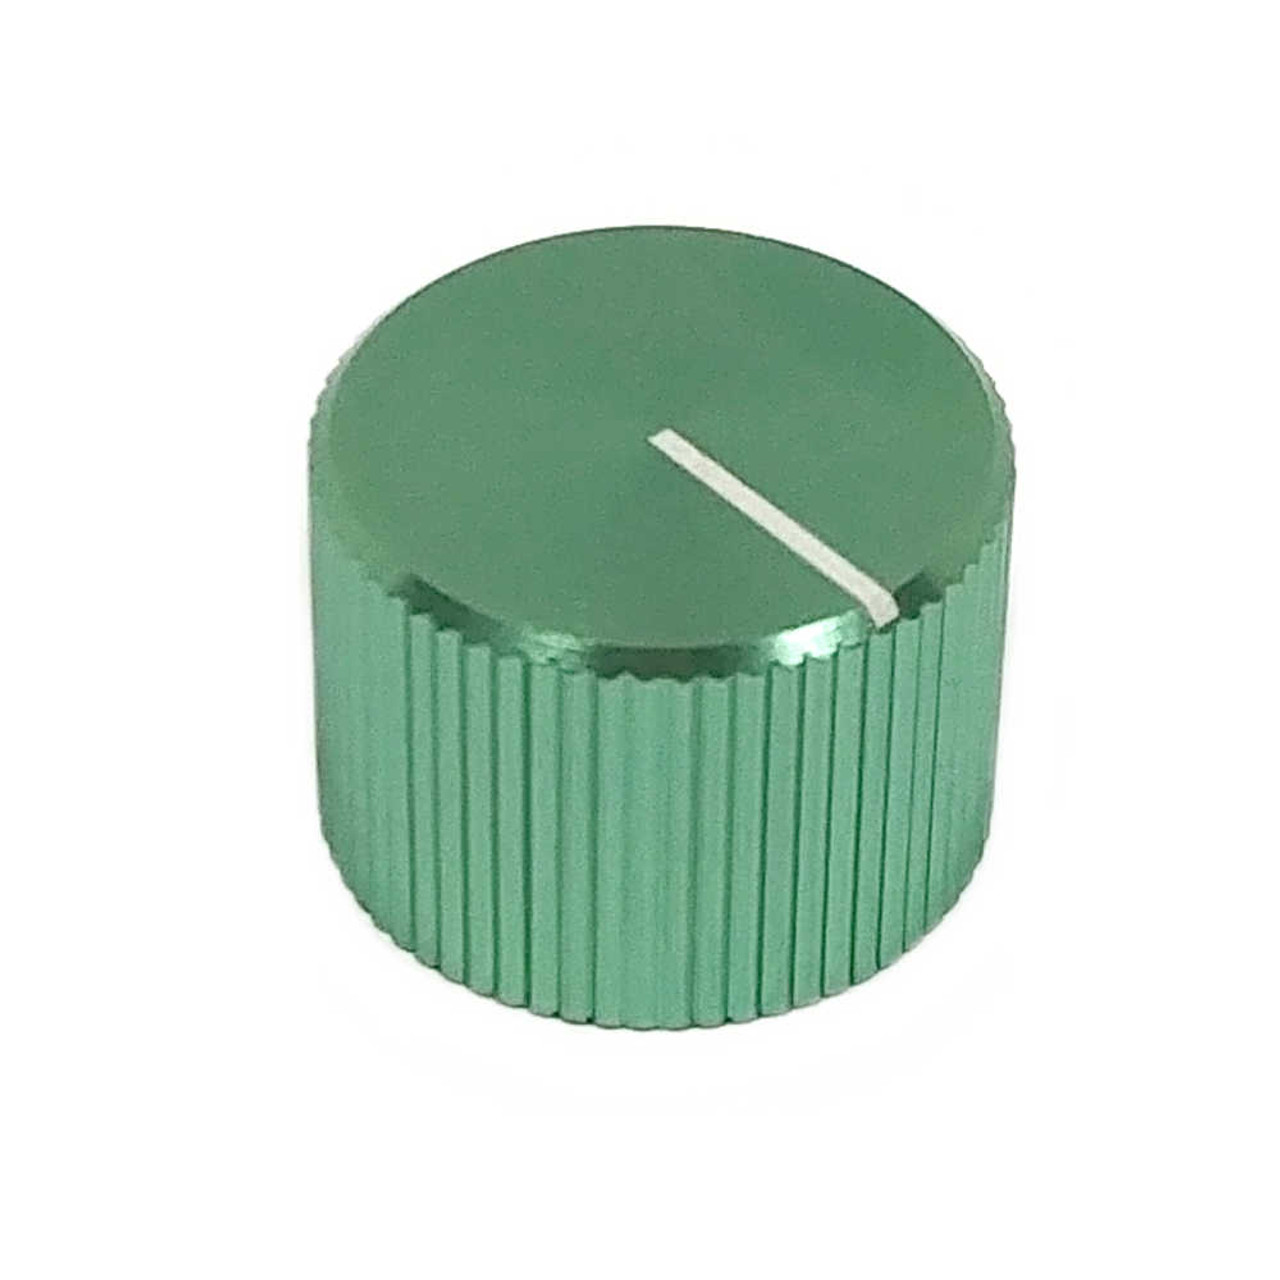 Anodized Aluminum Knob - Green